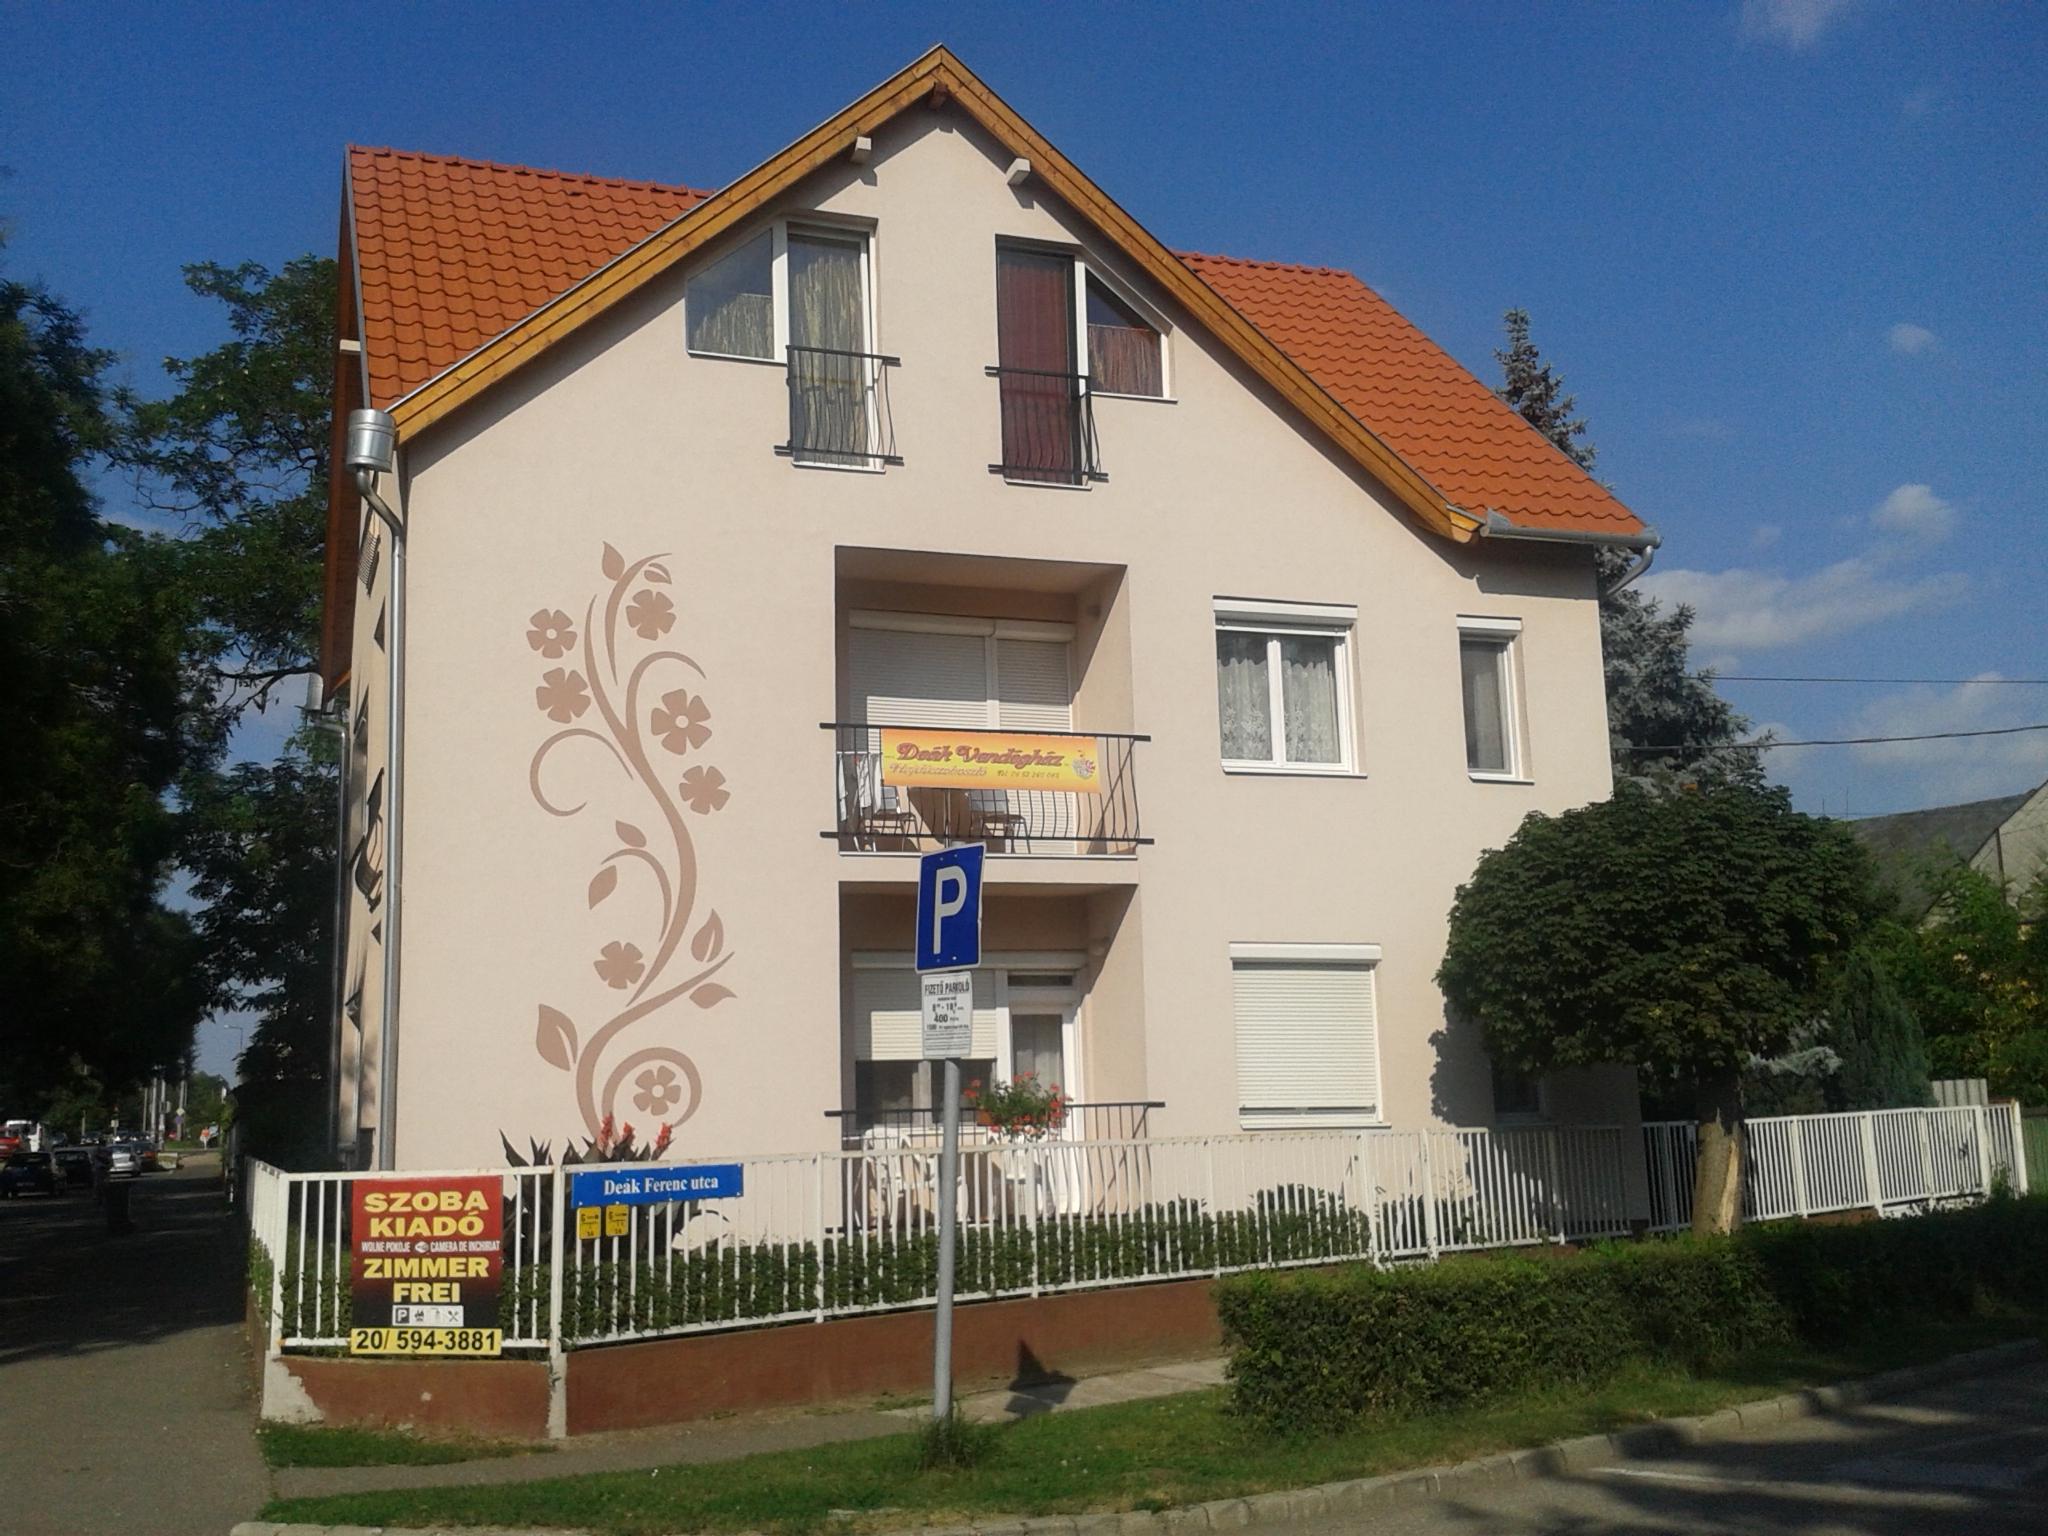 http://szallas-apartman-hajduszoboszlo.hu/wp-content/uploads/2014/07/20130703_1655581.jpg